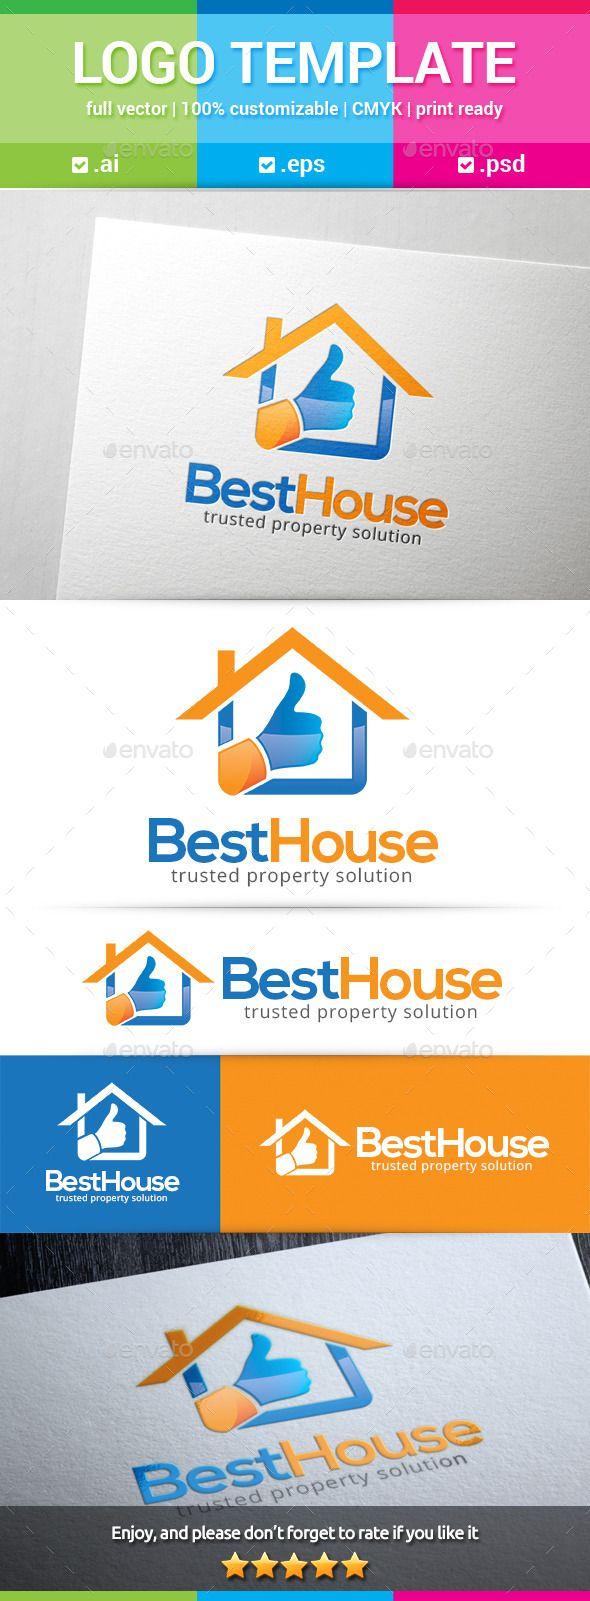 Best House Logo Template #design #logotype Download: http://graphicriver.net/item/best-house-logo/11320286?ref=ksioks